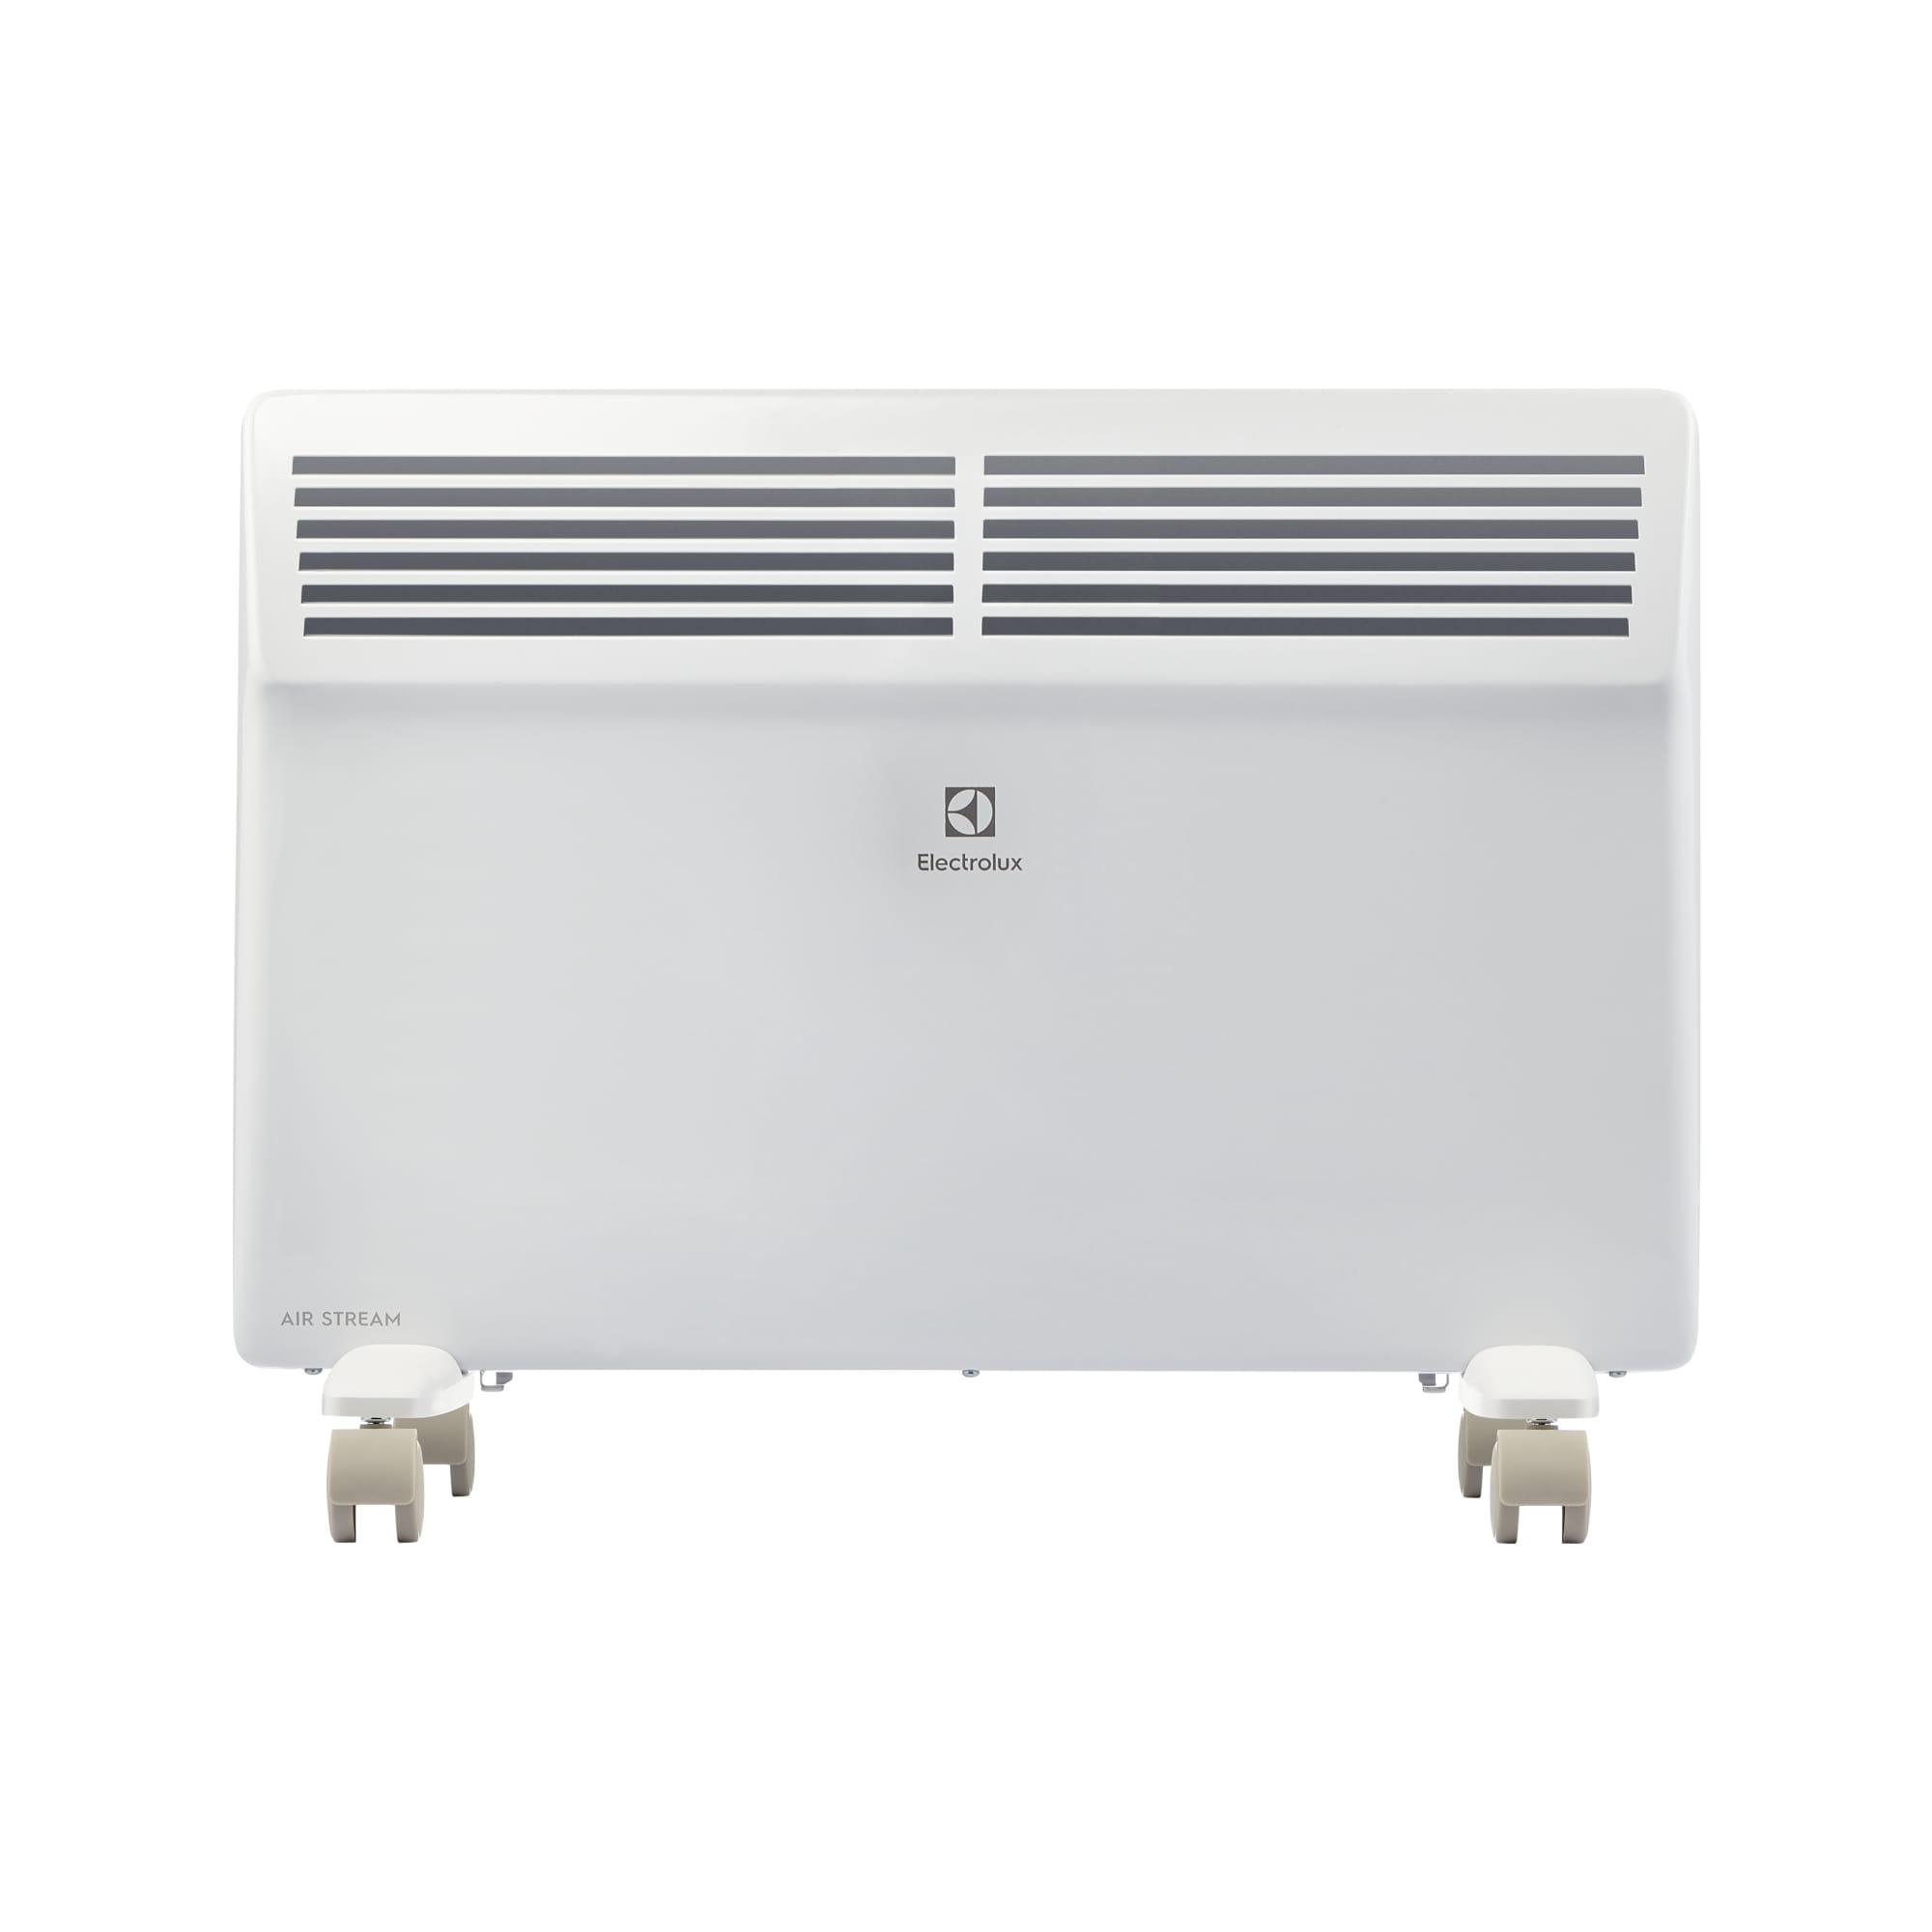 Конвектор Electrolux Air Stream ECH/AS-1500 MR